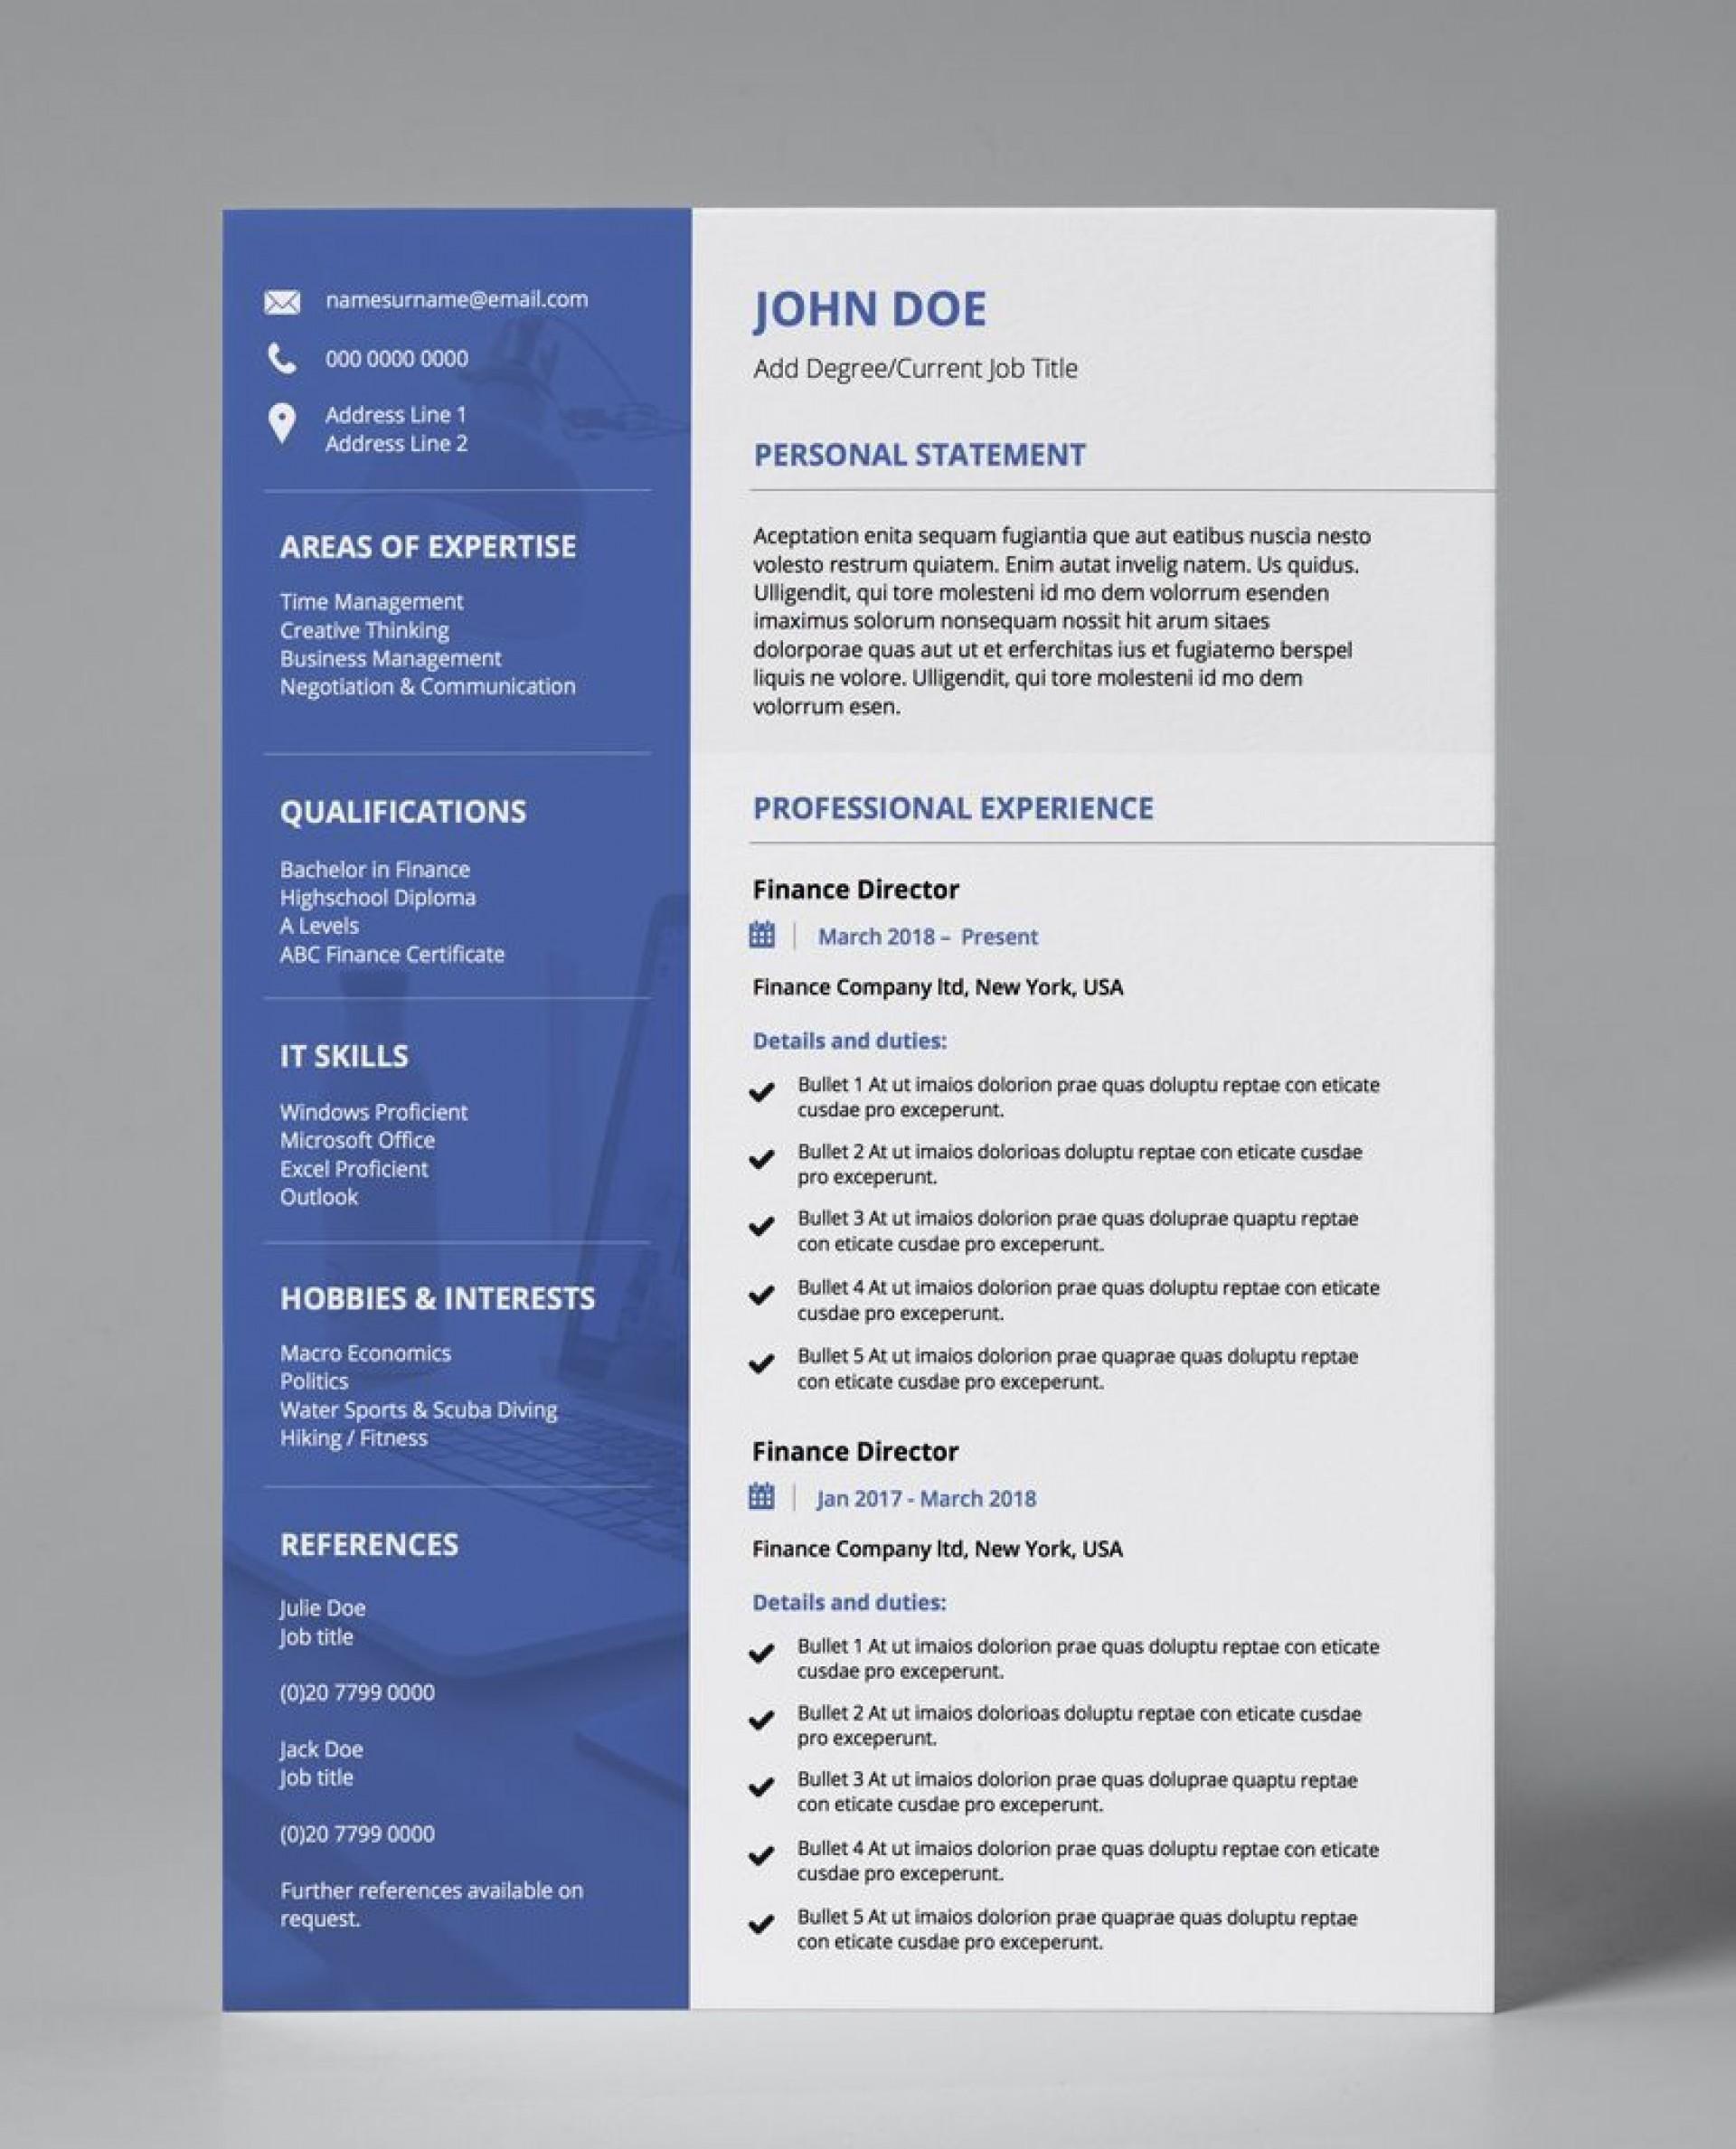 001 Singular Professional Cv Template Free Online Idea  Resume1920